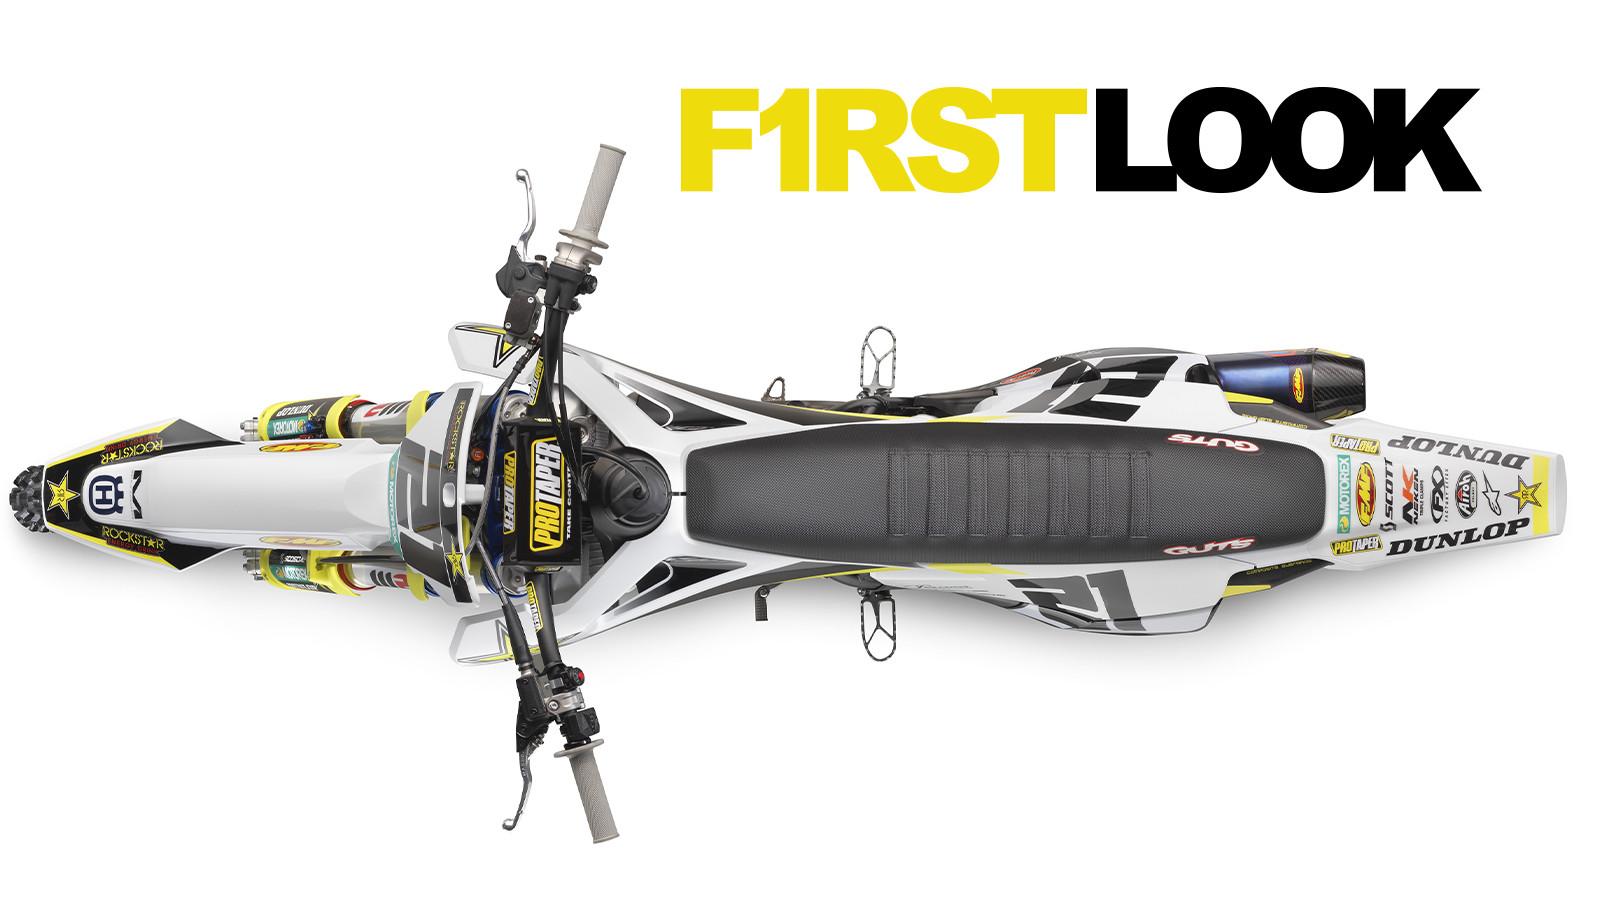 First Look: 2020 Husqvarna FC 450 Rockstar Edition